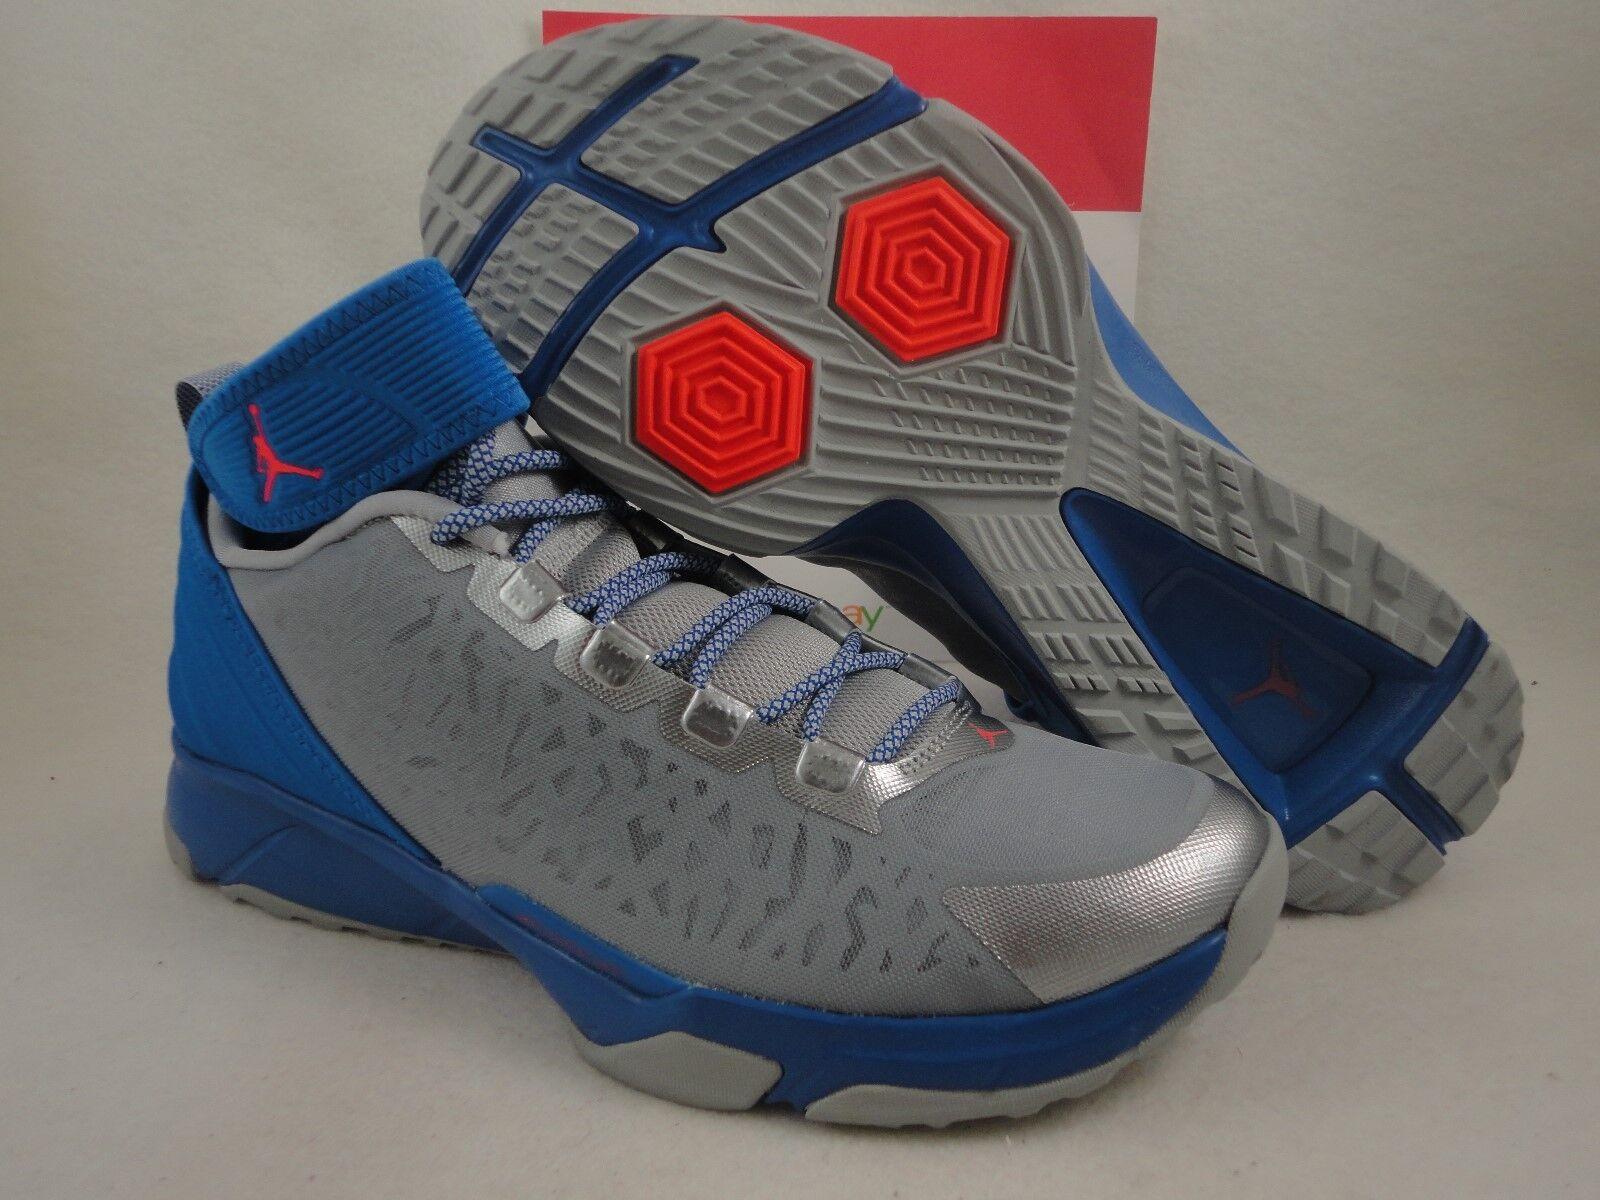 Nike Jordan Dominate Pro 2, Sport Blue / Infrared 23 / Wolf Grey, Comfortable